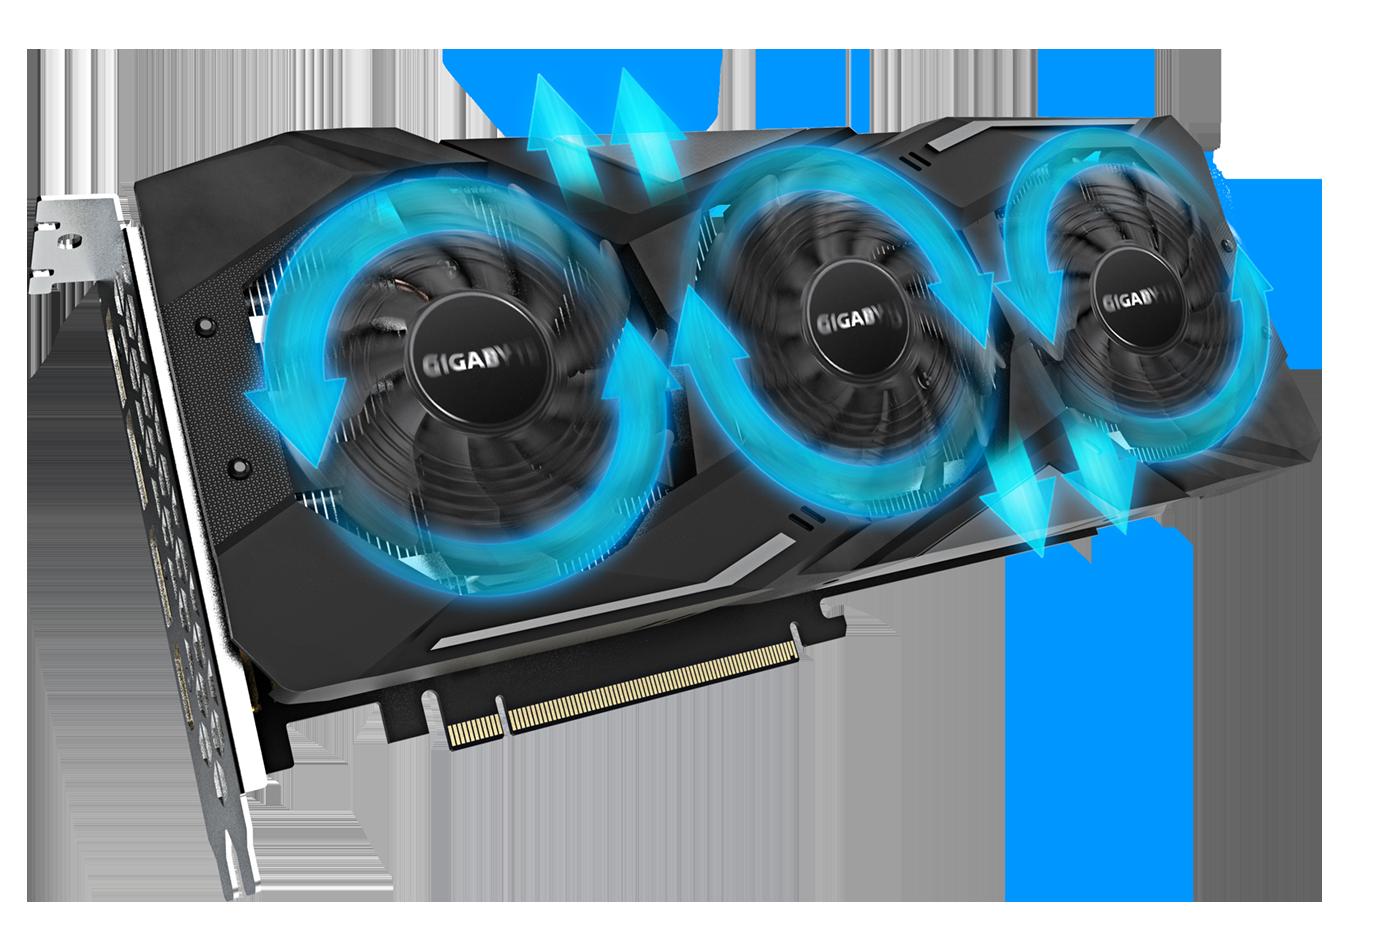 GIGABYTE Radeon™ RX 5500 XT GAMING OC 4G